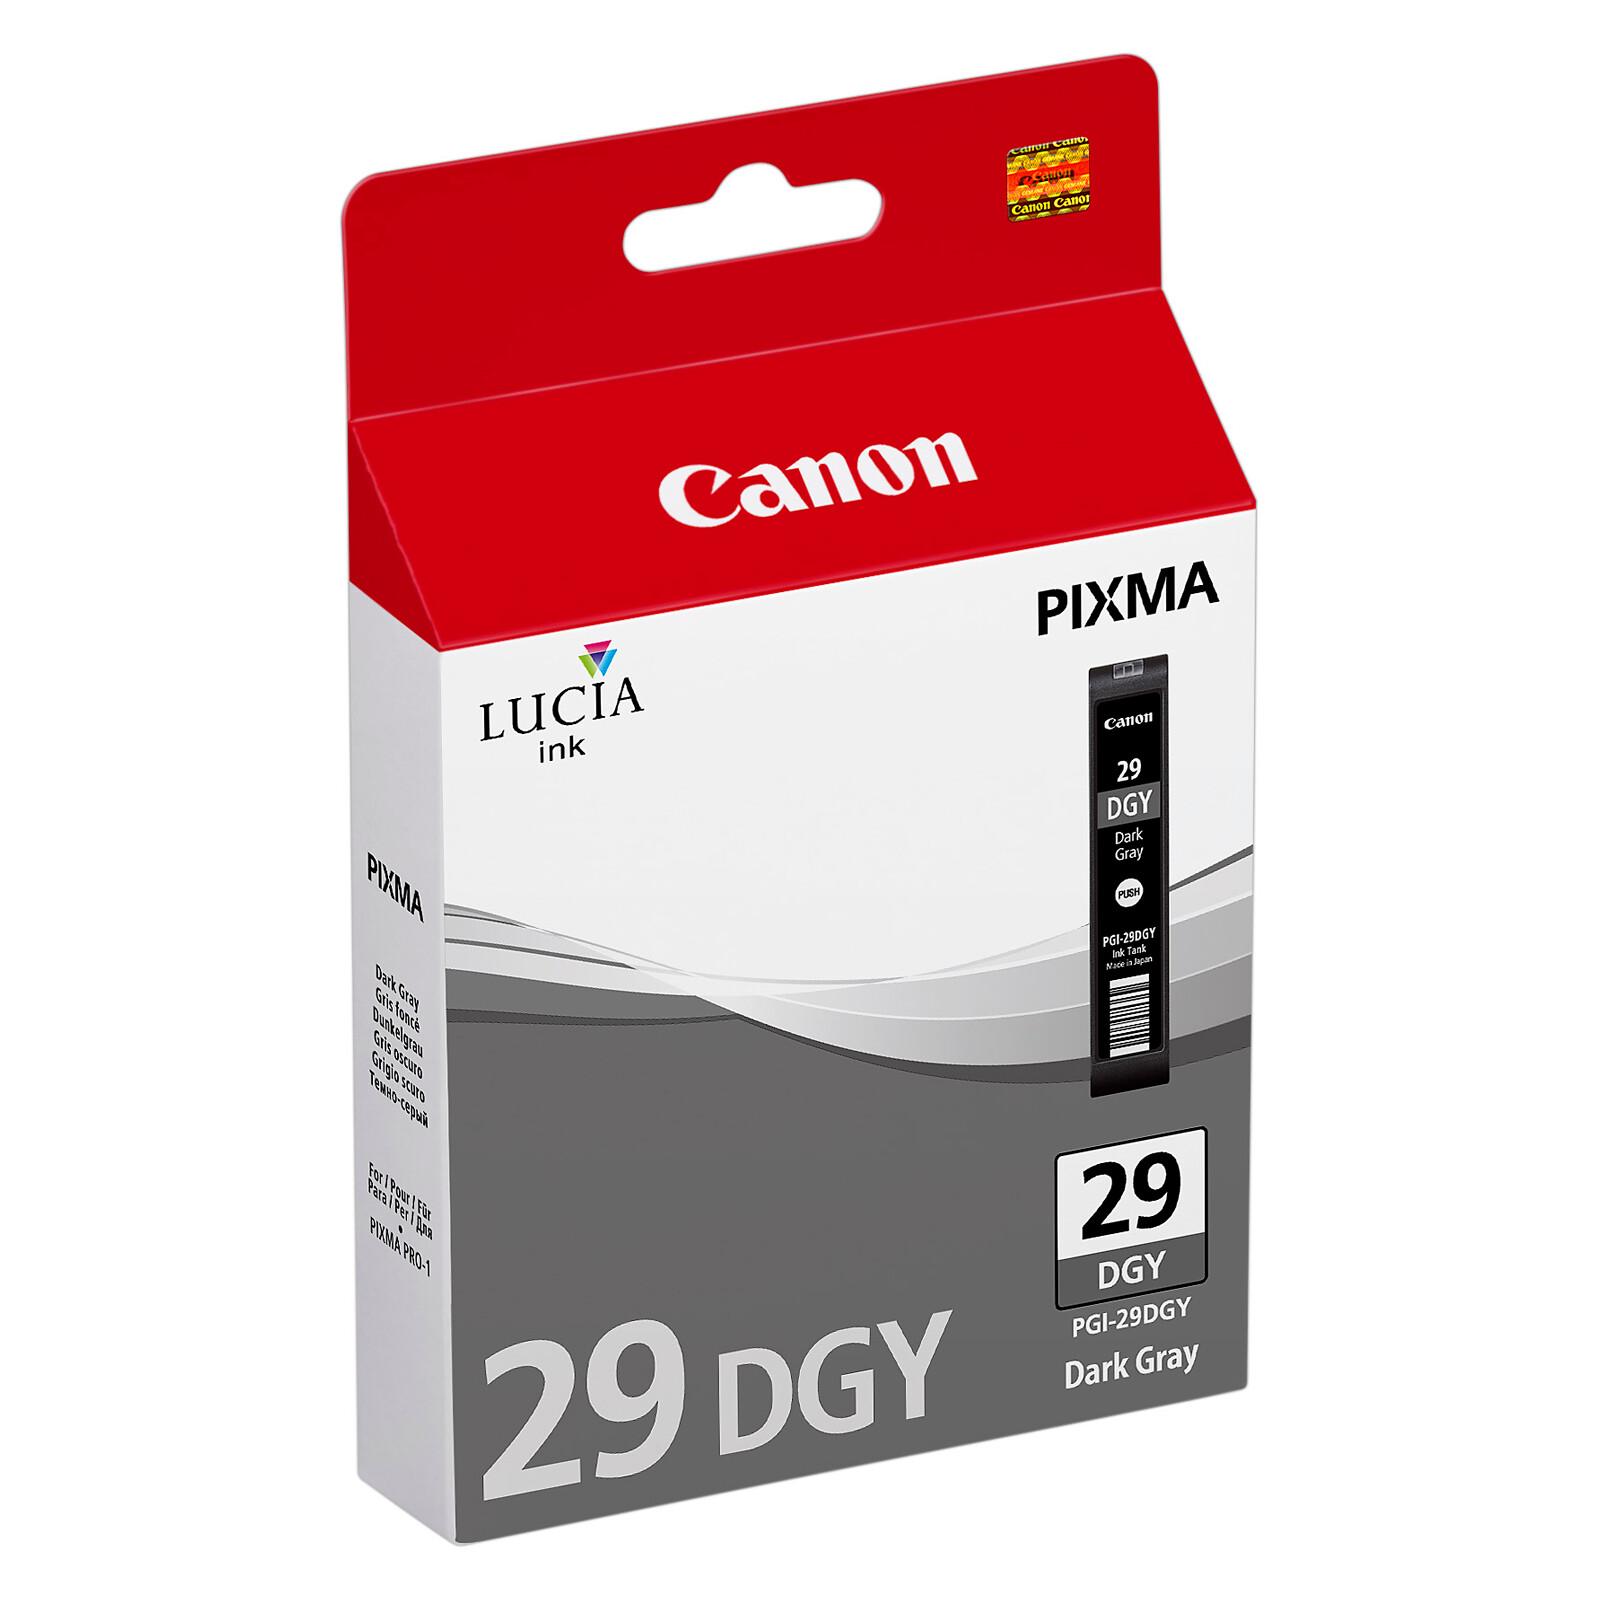 Canon PGI-29DGY Tinte Dark Grey